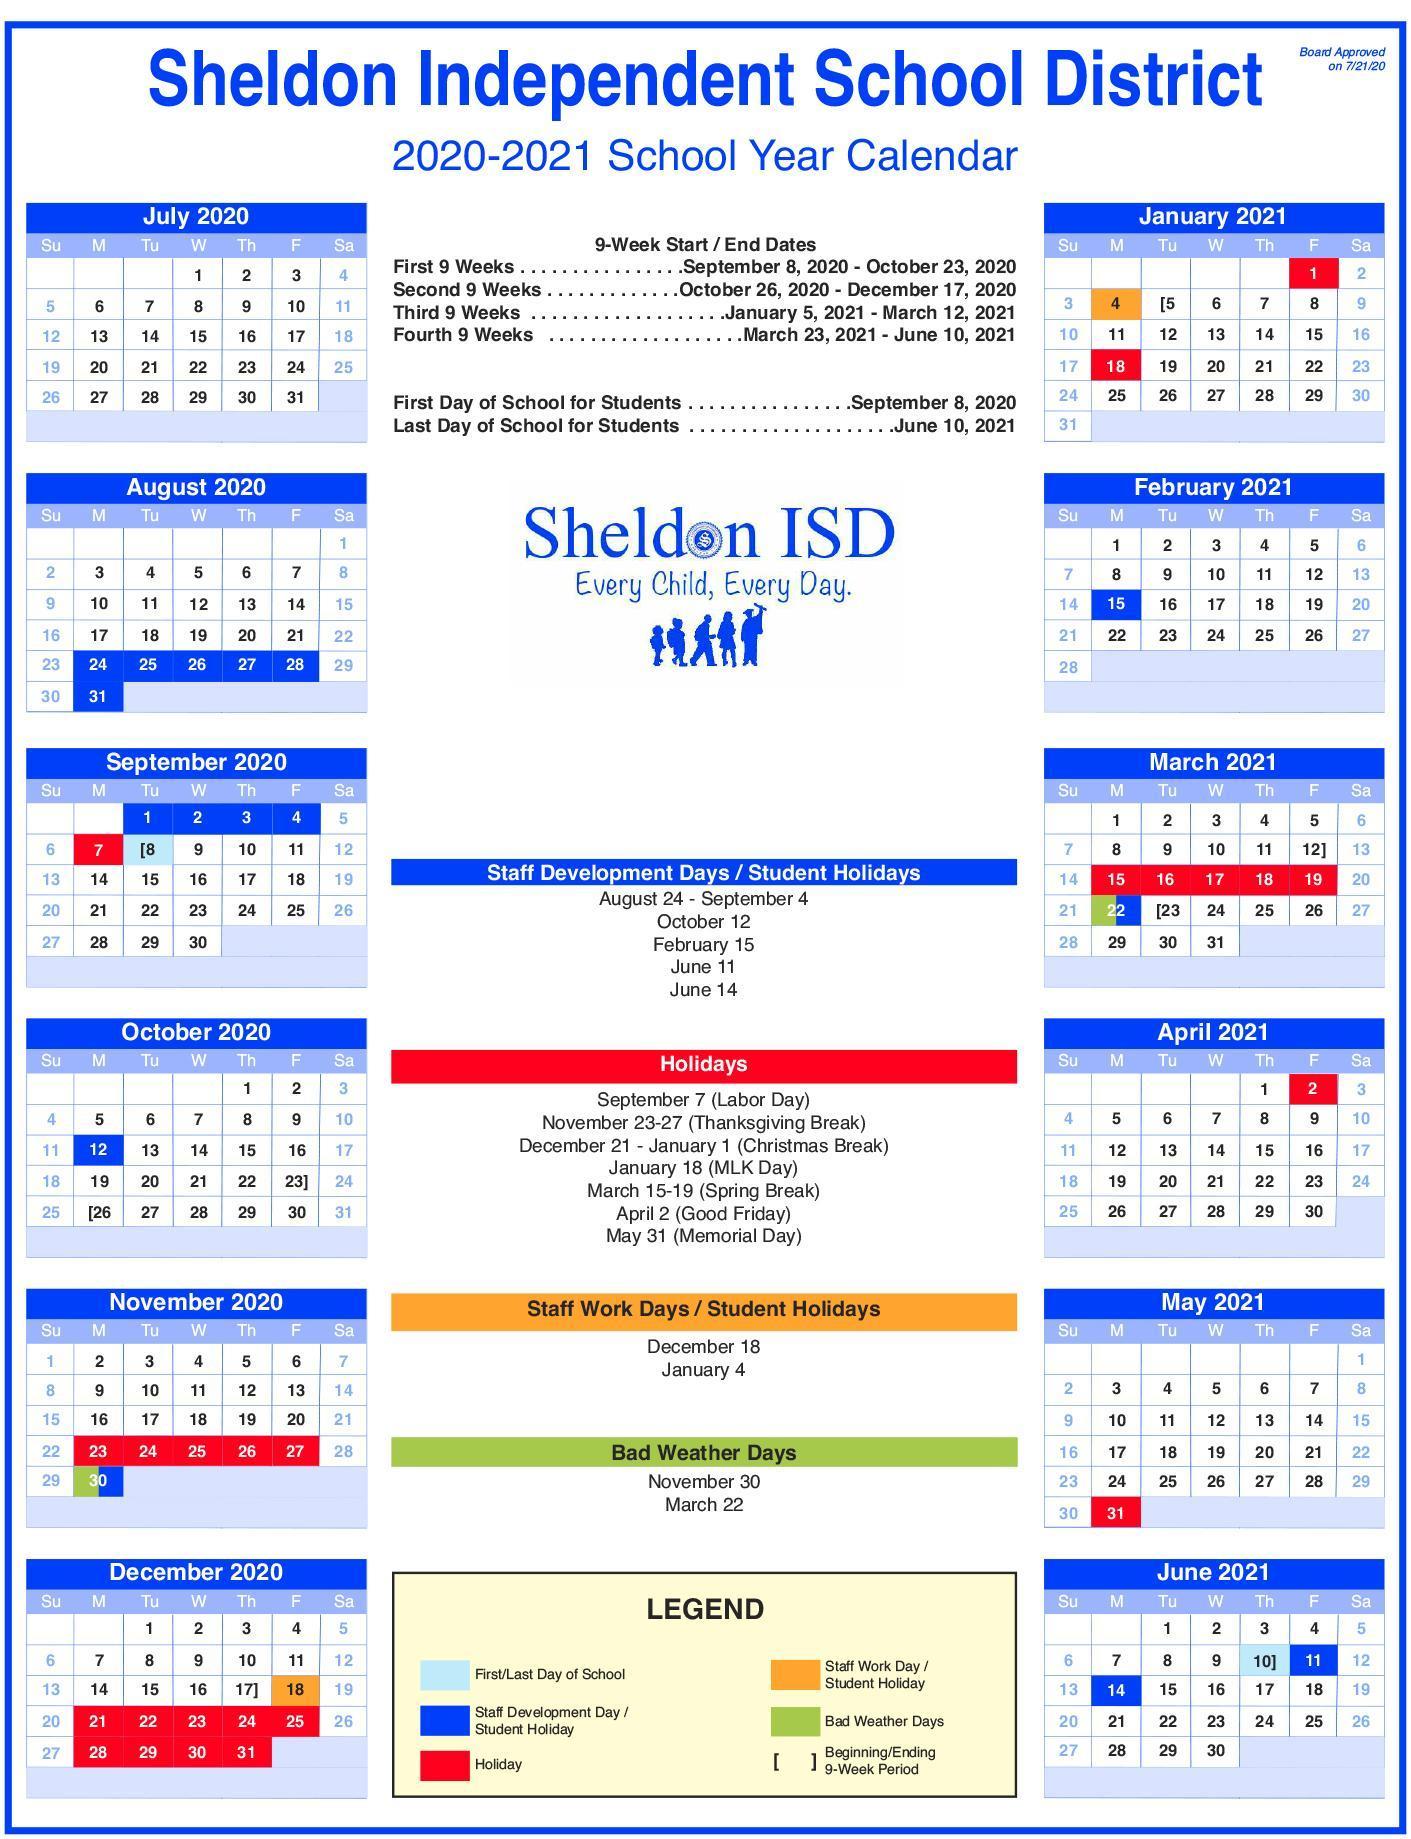 board_approved_sheldon_isd_2020_2021_school_year_calendar_as_of_072120